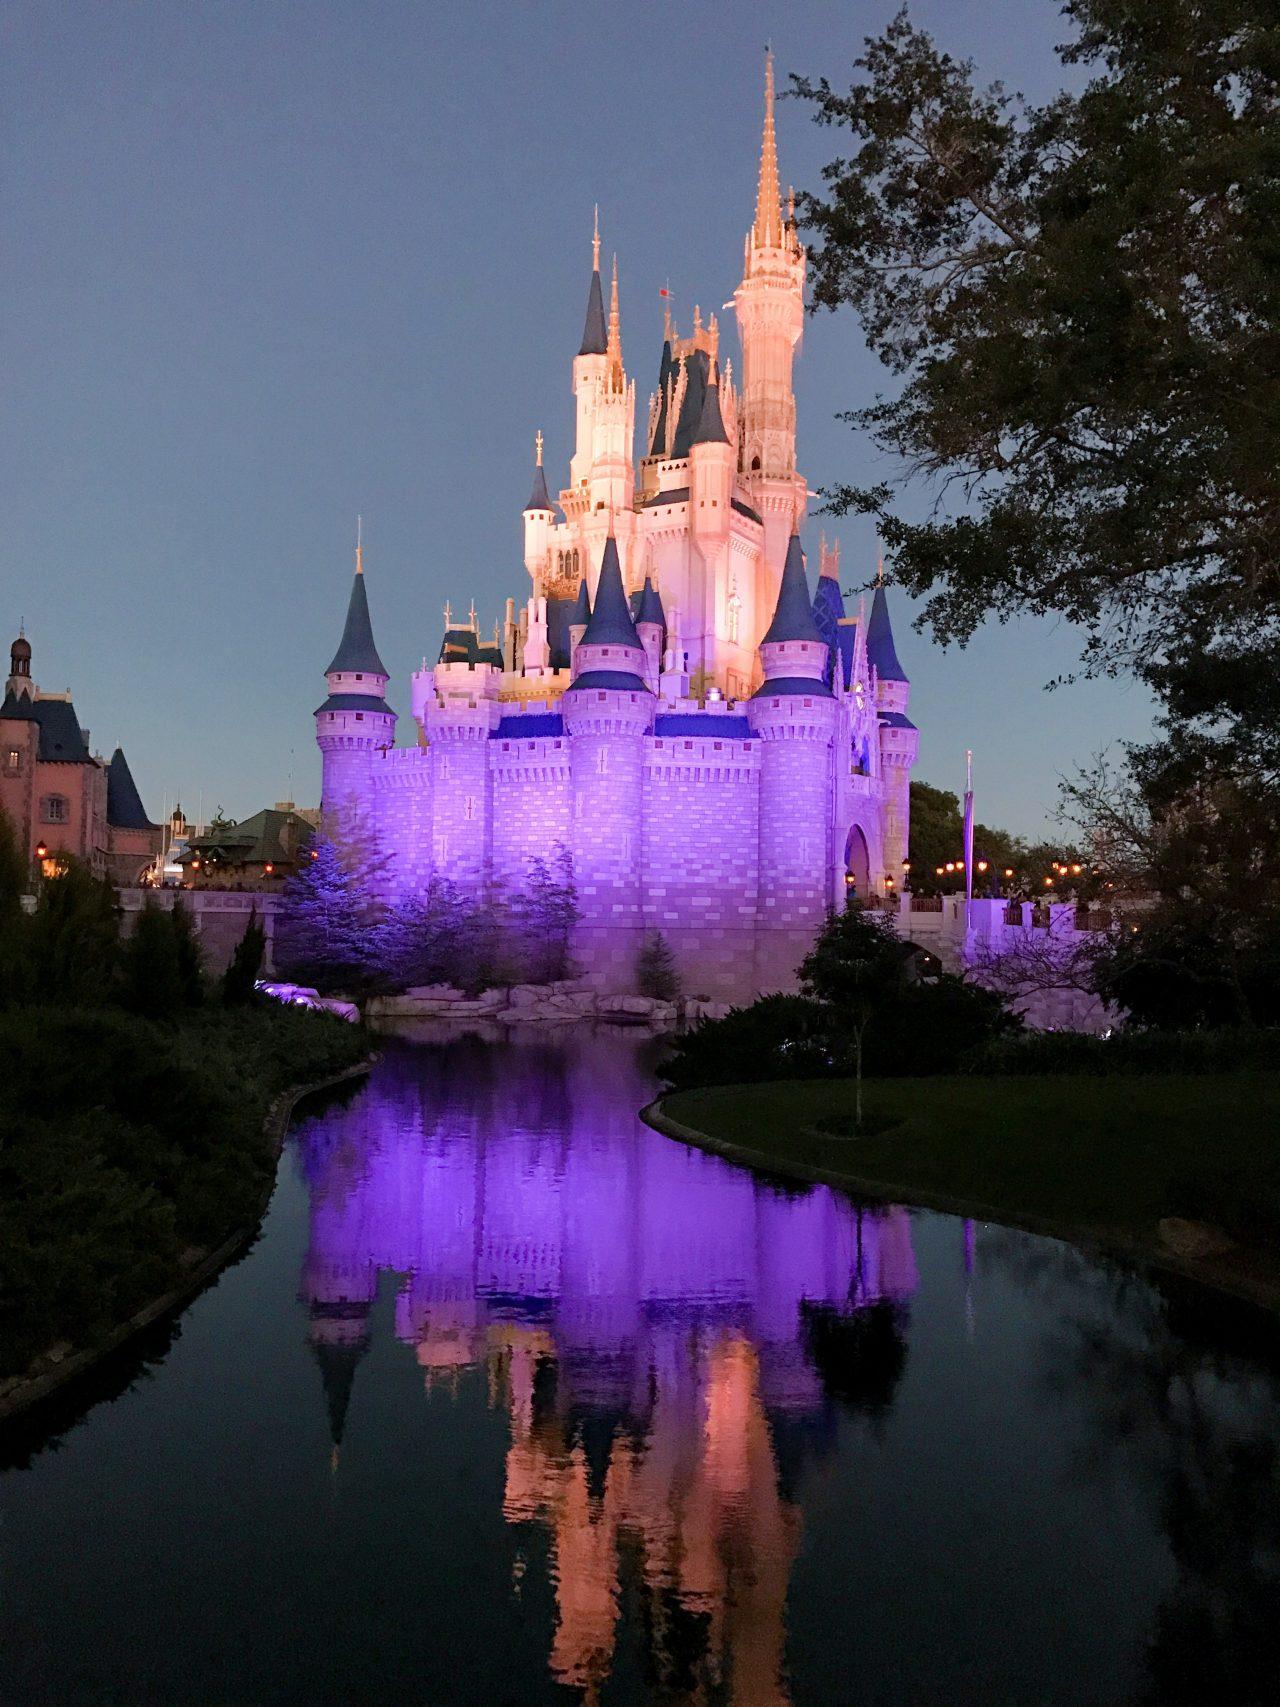 Cinderella's castle, disney world, magic kingdom, orlando family activities, orlando photographer